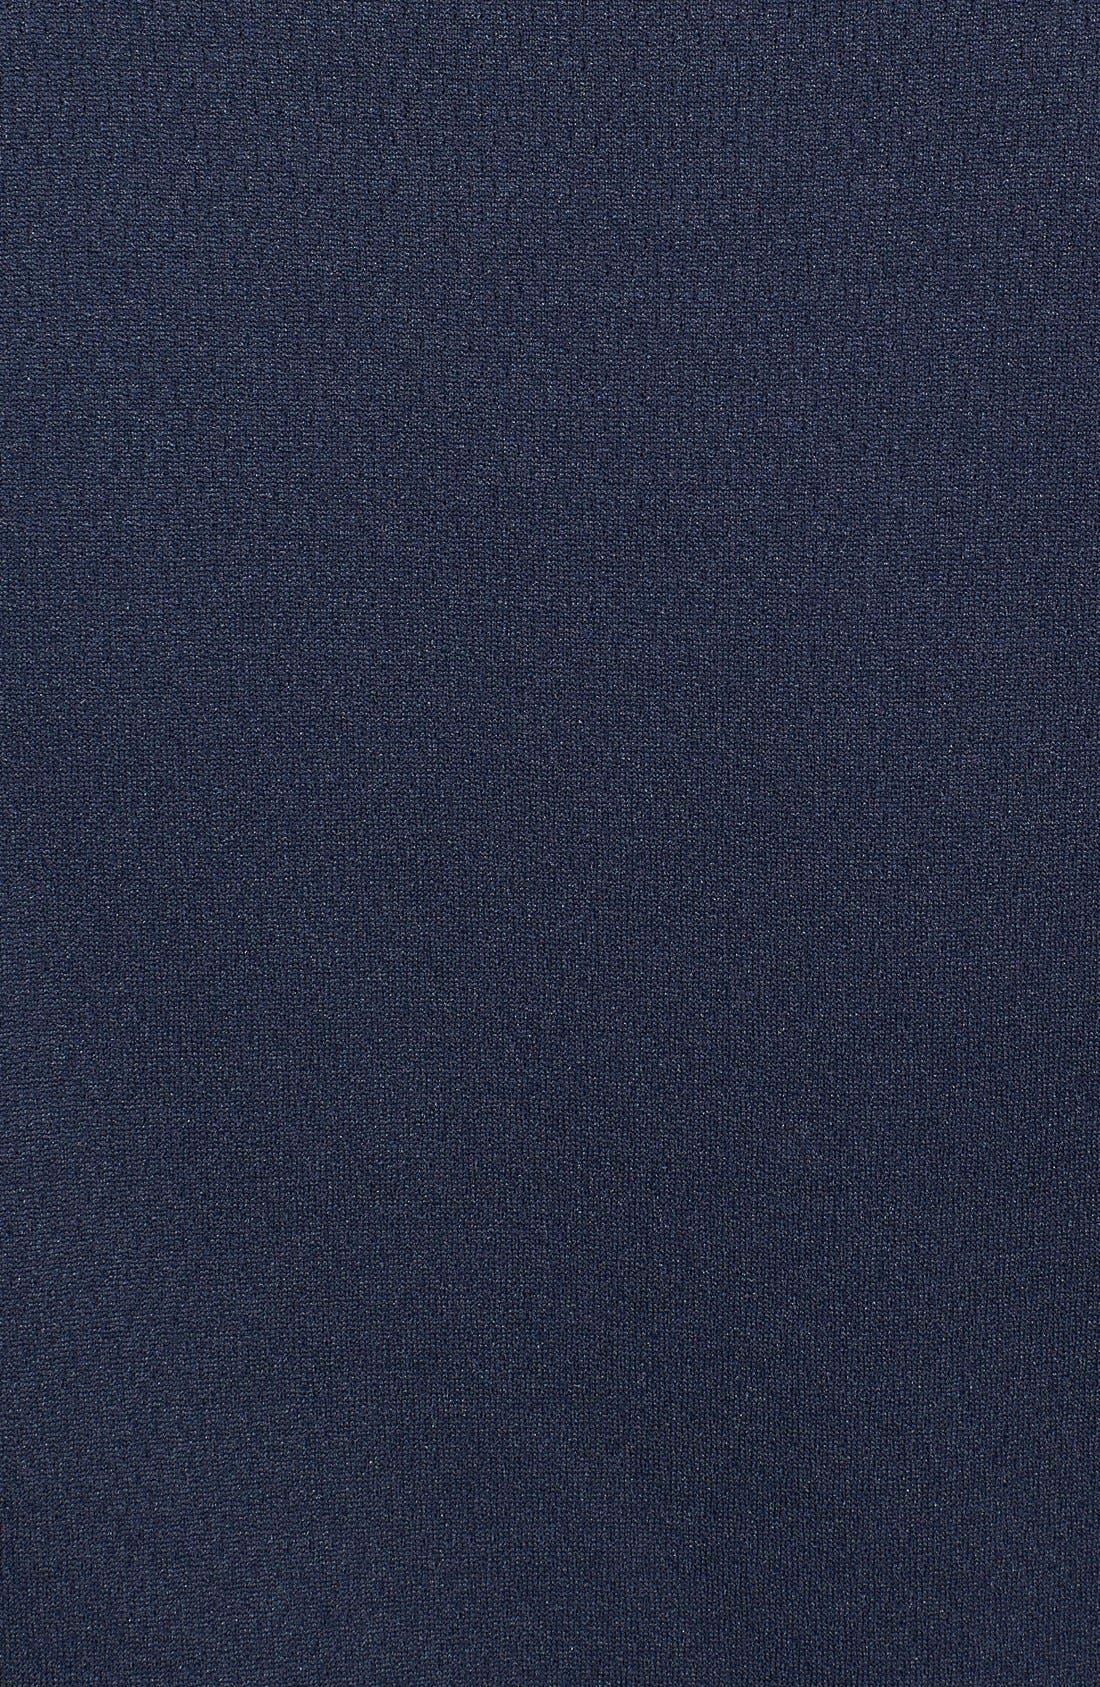 Alternate Image 3  - Cutter & Buck San Diego Chargers - Edge DryTec Moisture Wicking Half Zip Pullover